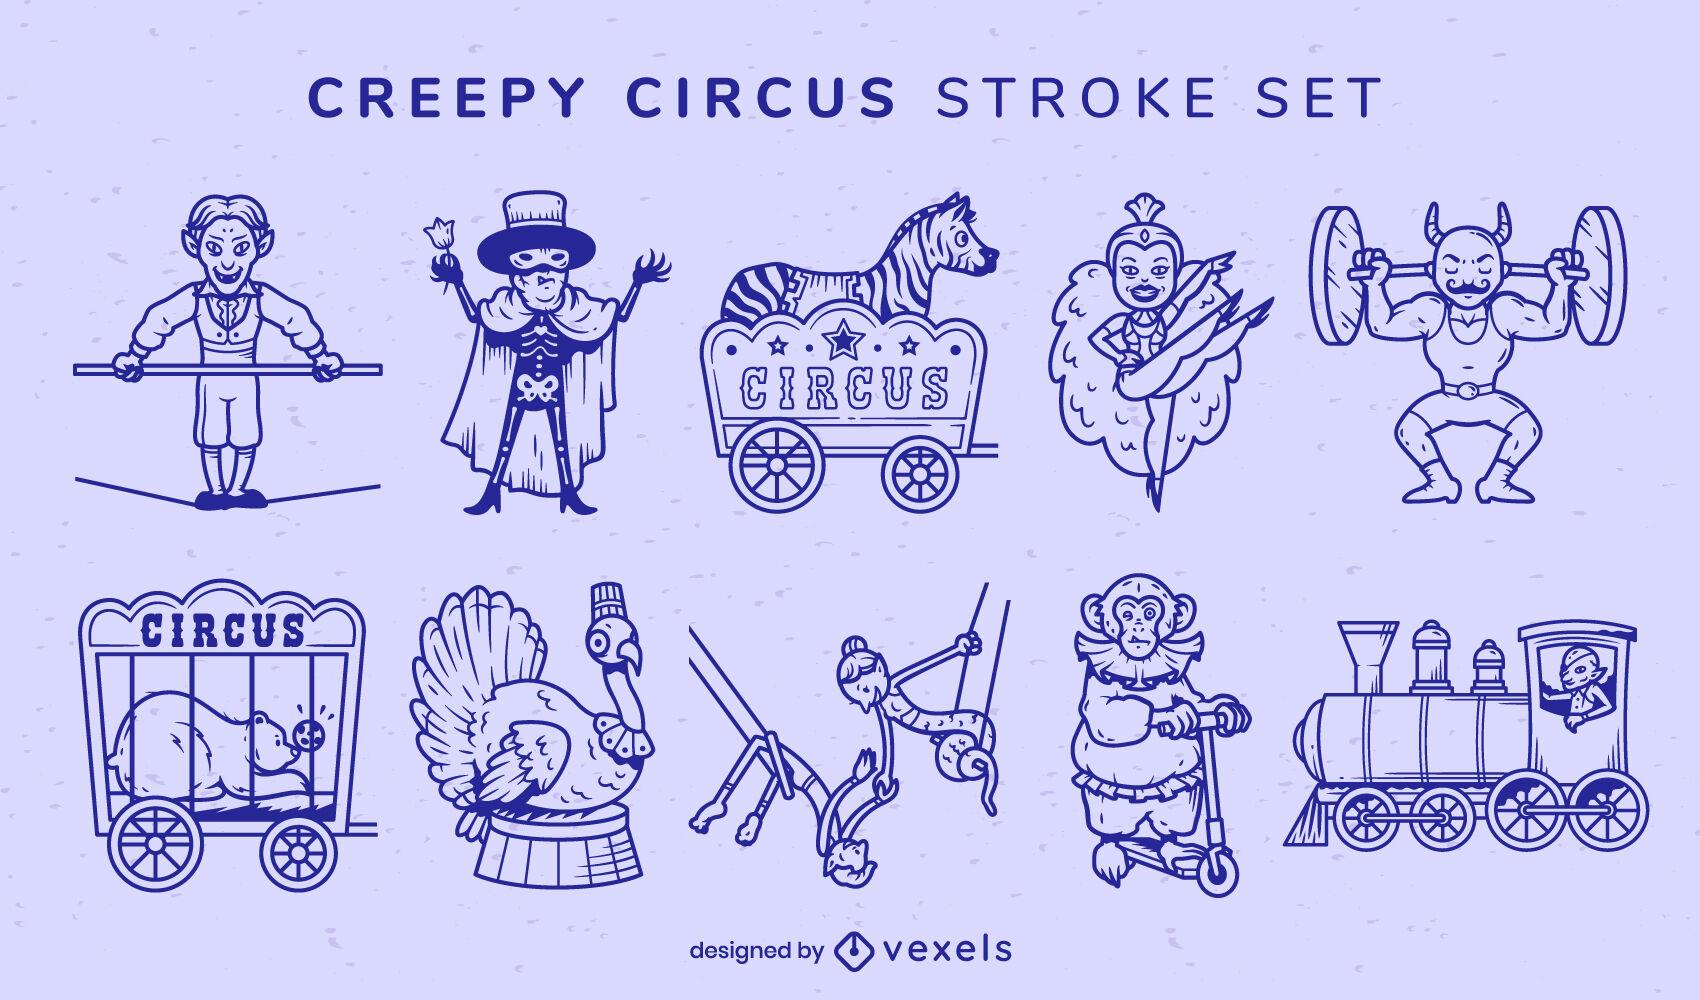 Circus performers creepy characters stroke set